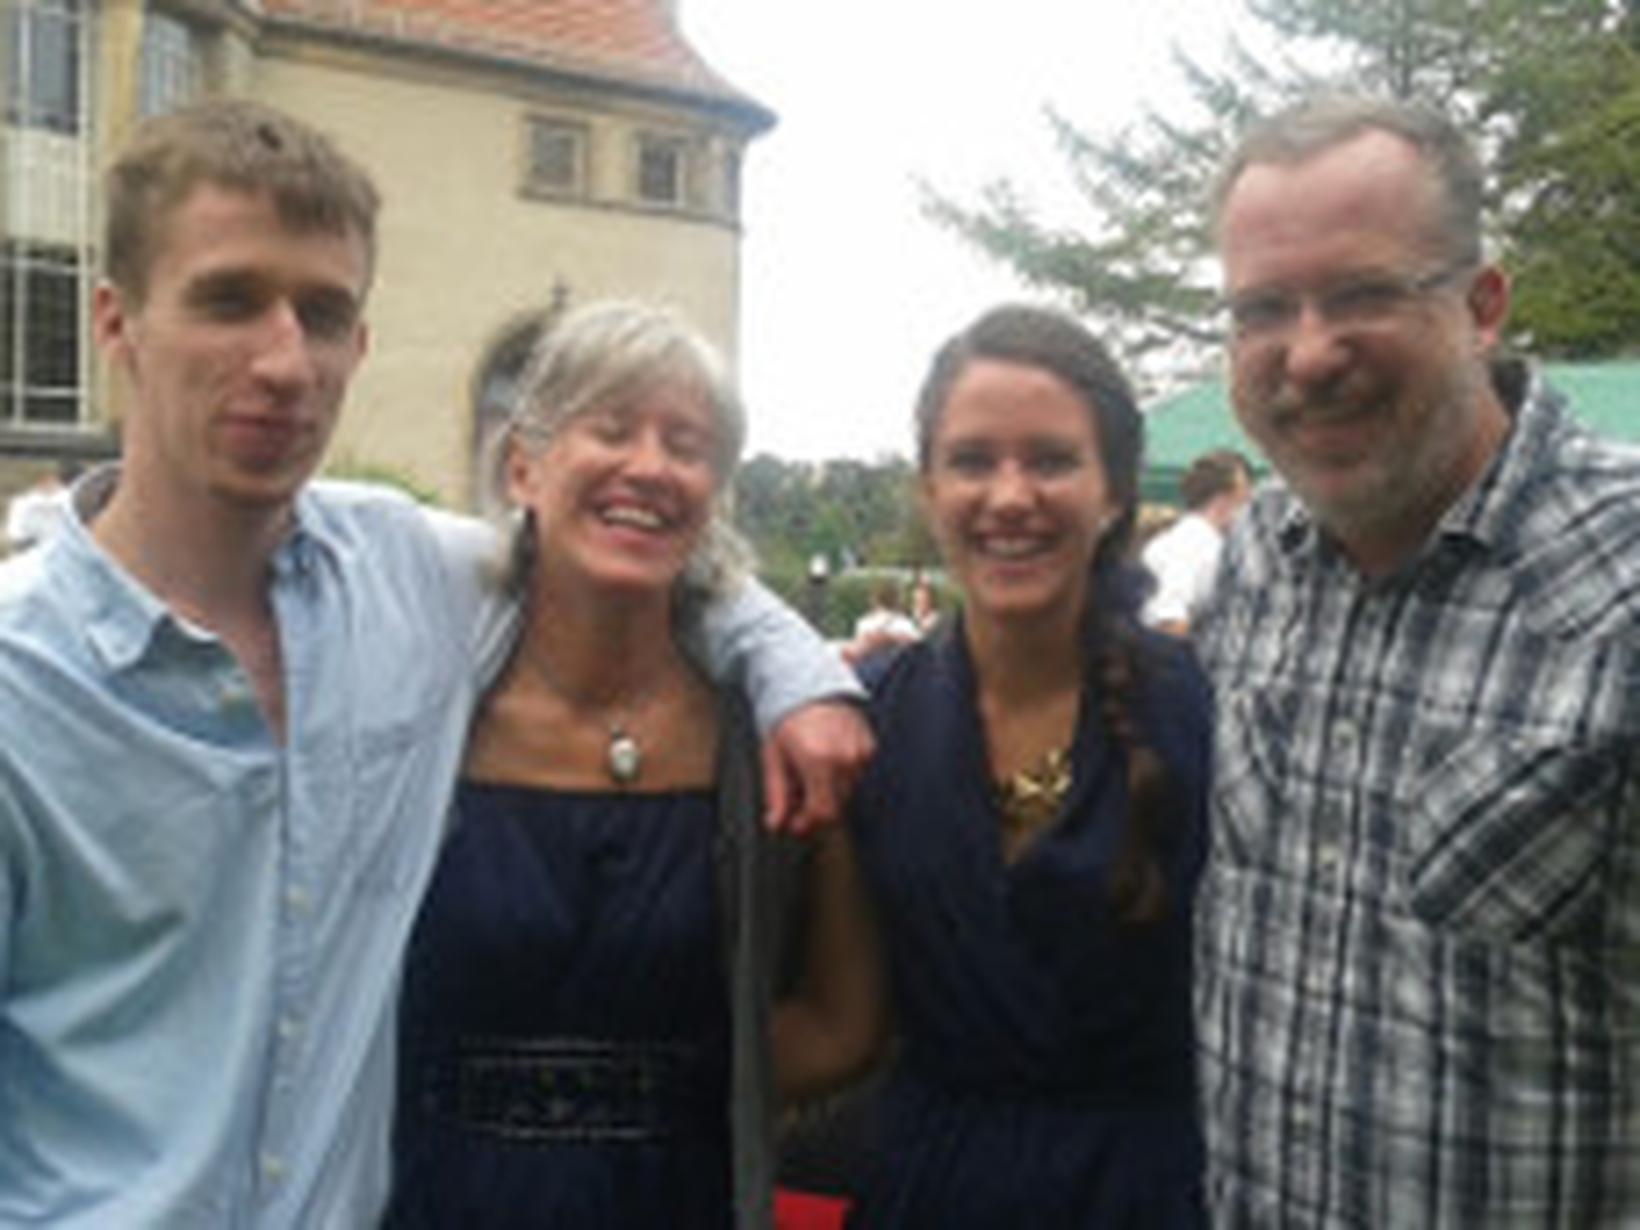 Rob & Bridget from Munich, Germany